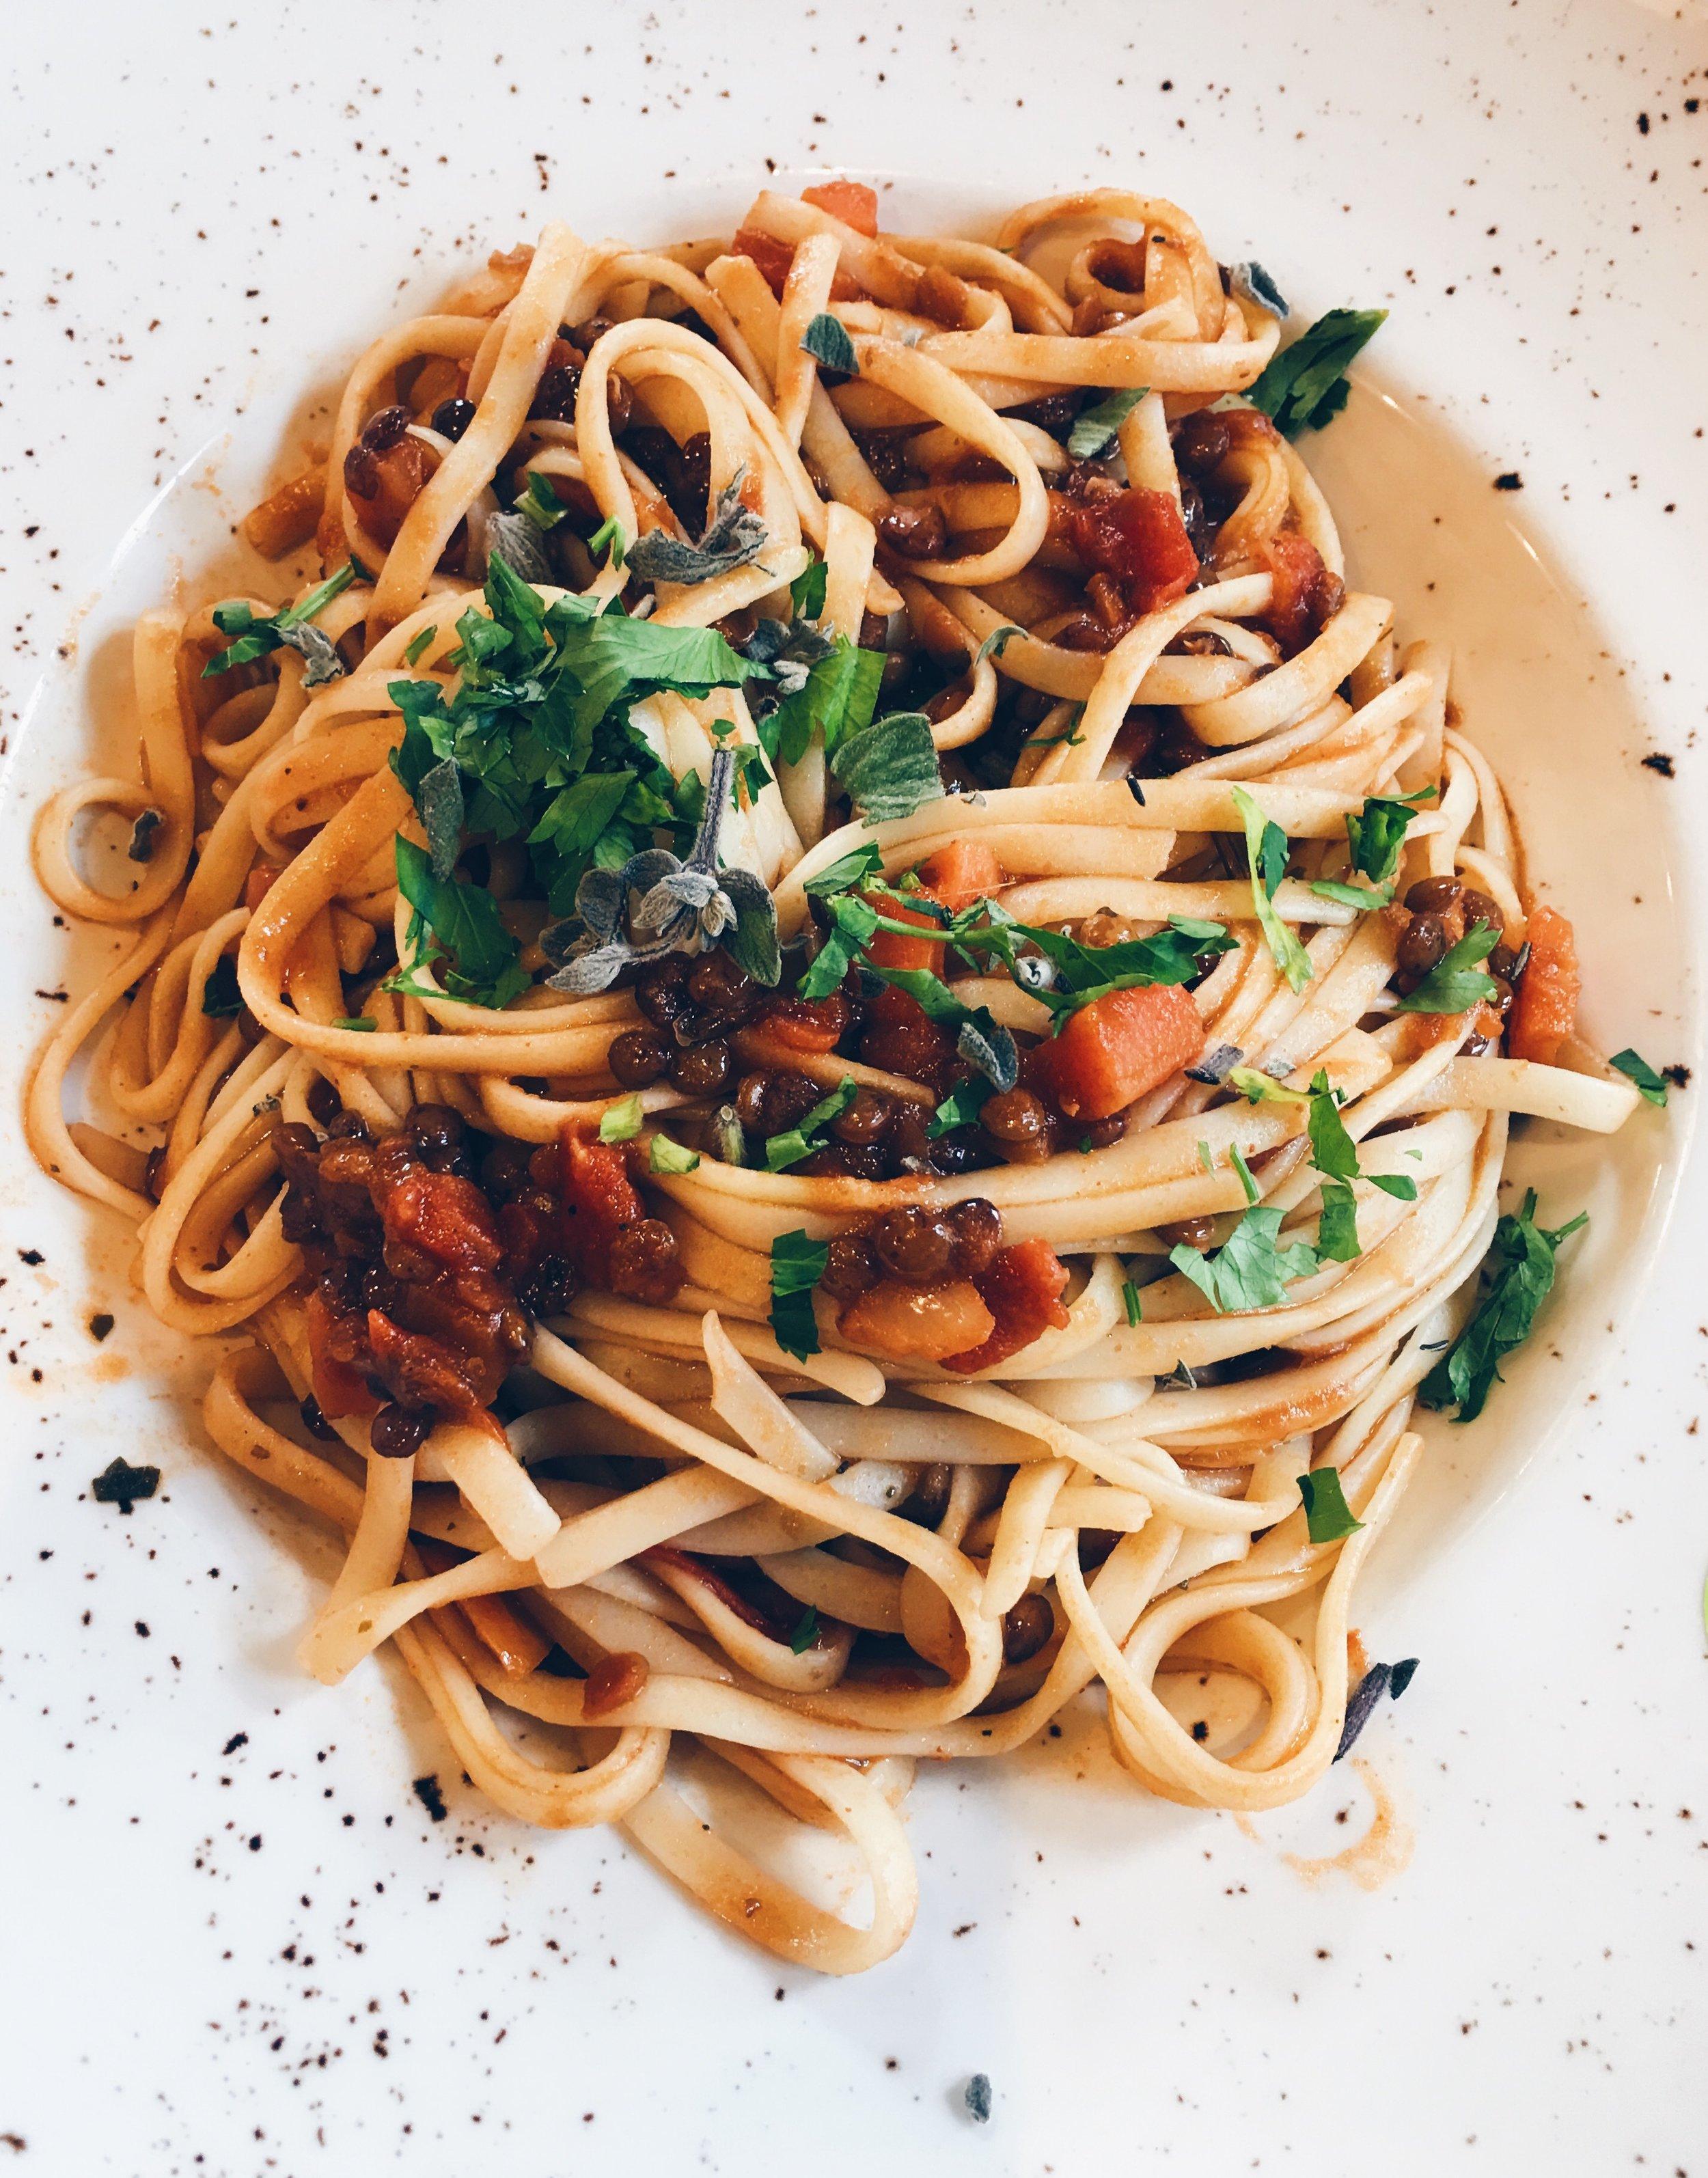 Pasta from Zizzi's